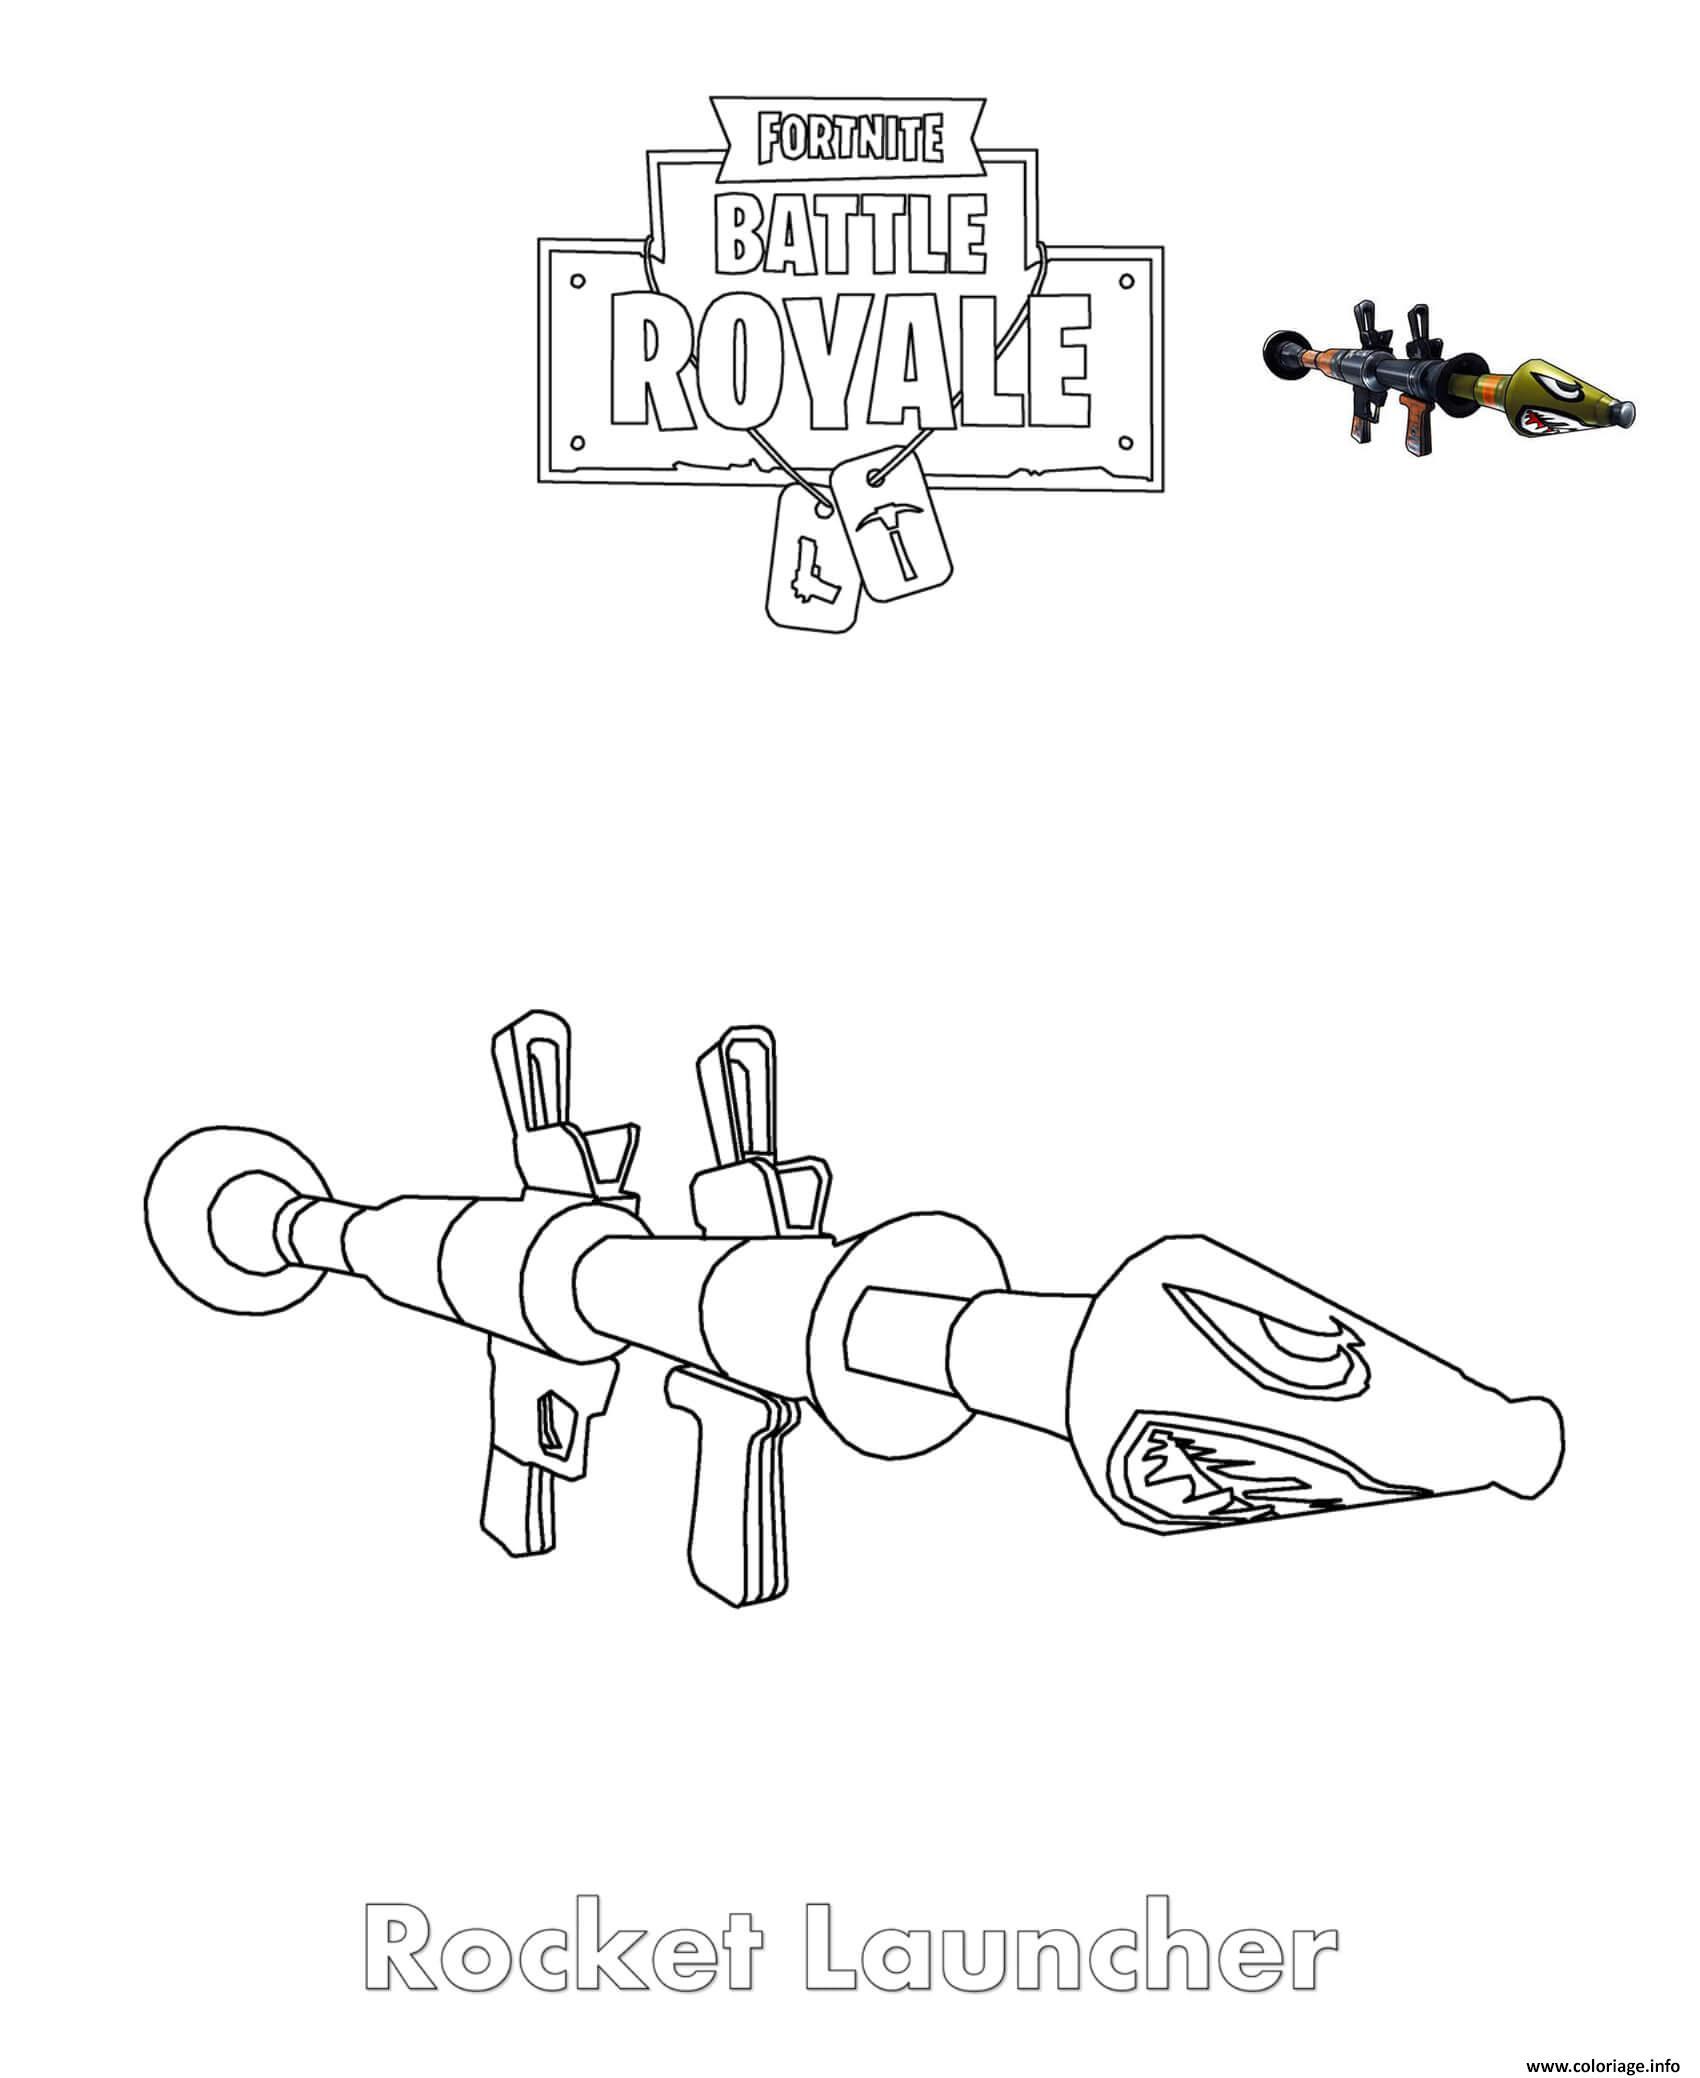 Coloriage Fortnite Graffeuse.Coloriage Rocket Launcher Fortnite Jecolorie Com